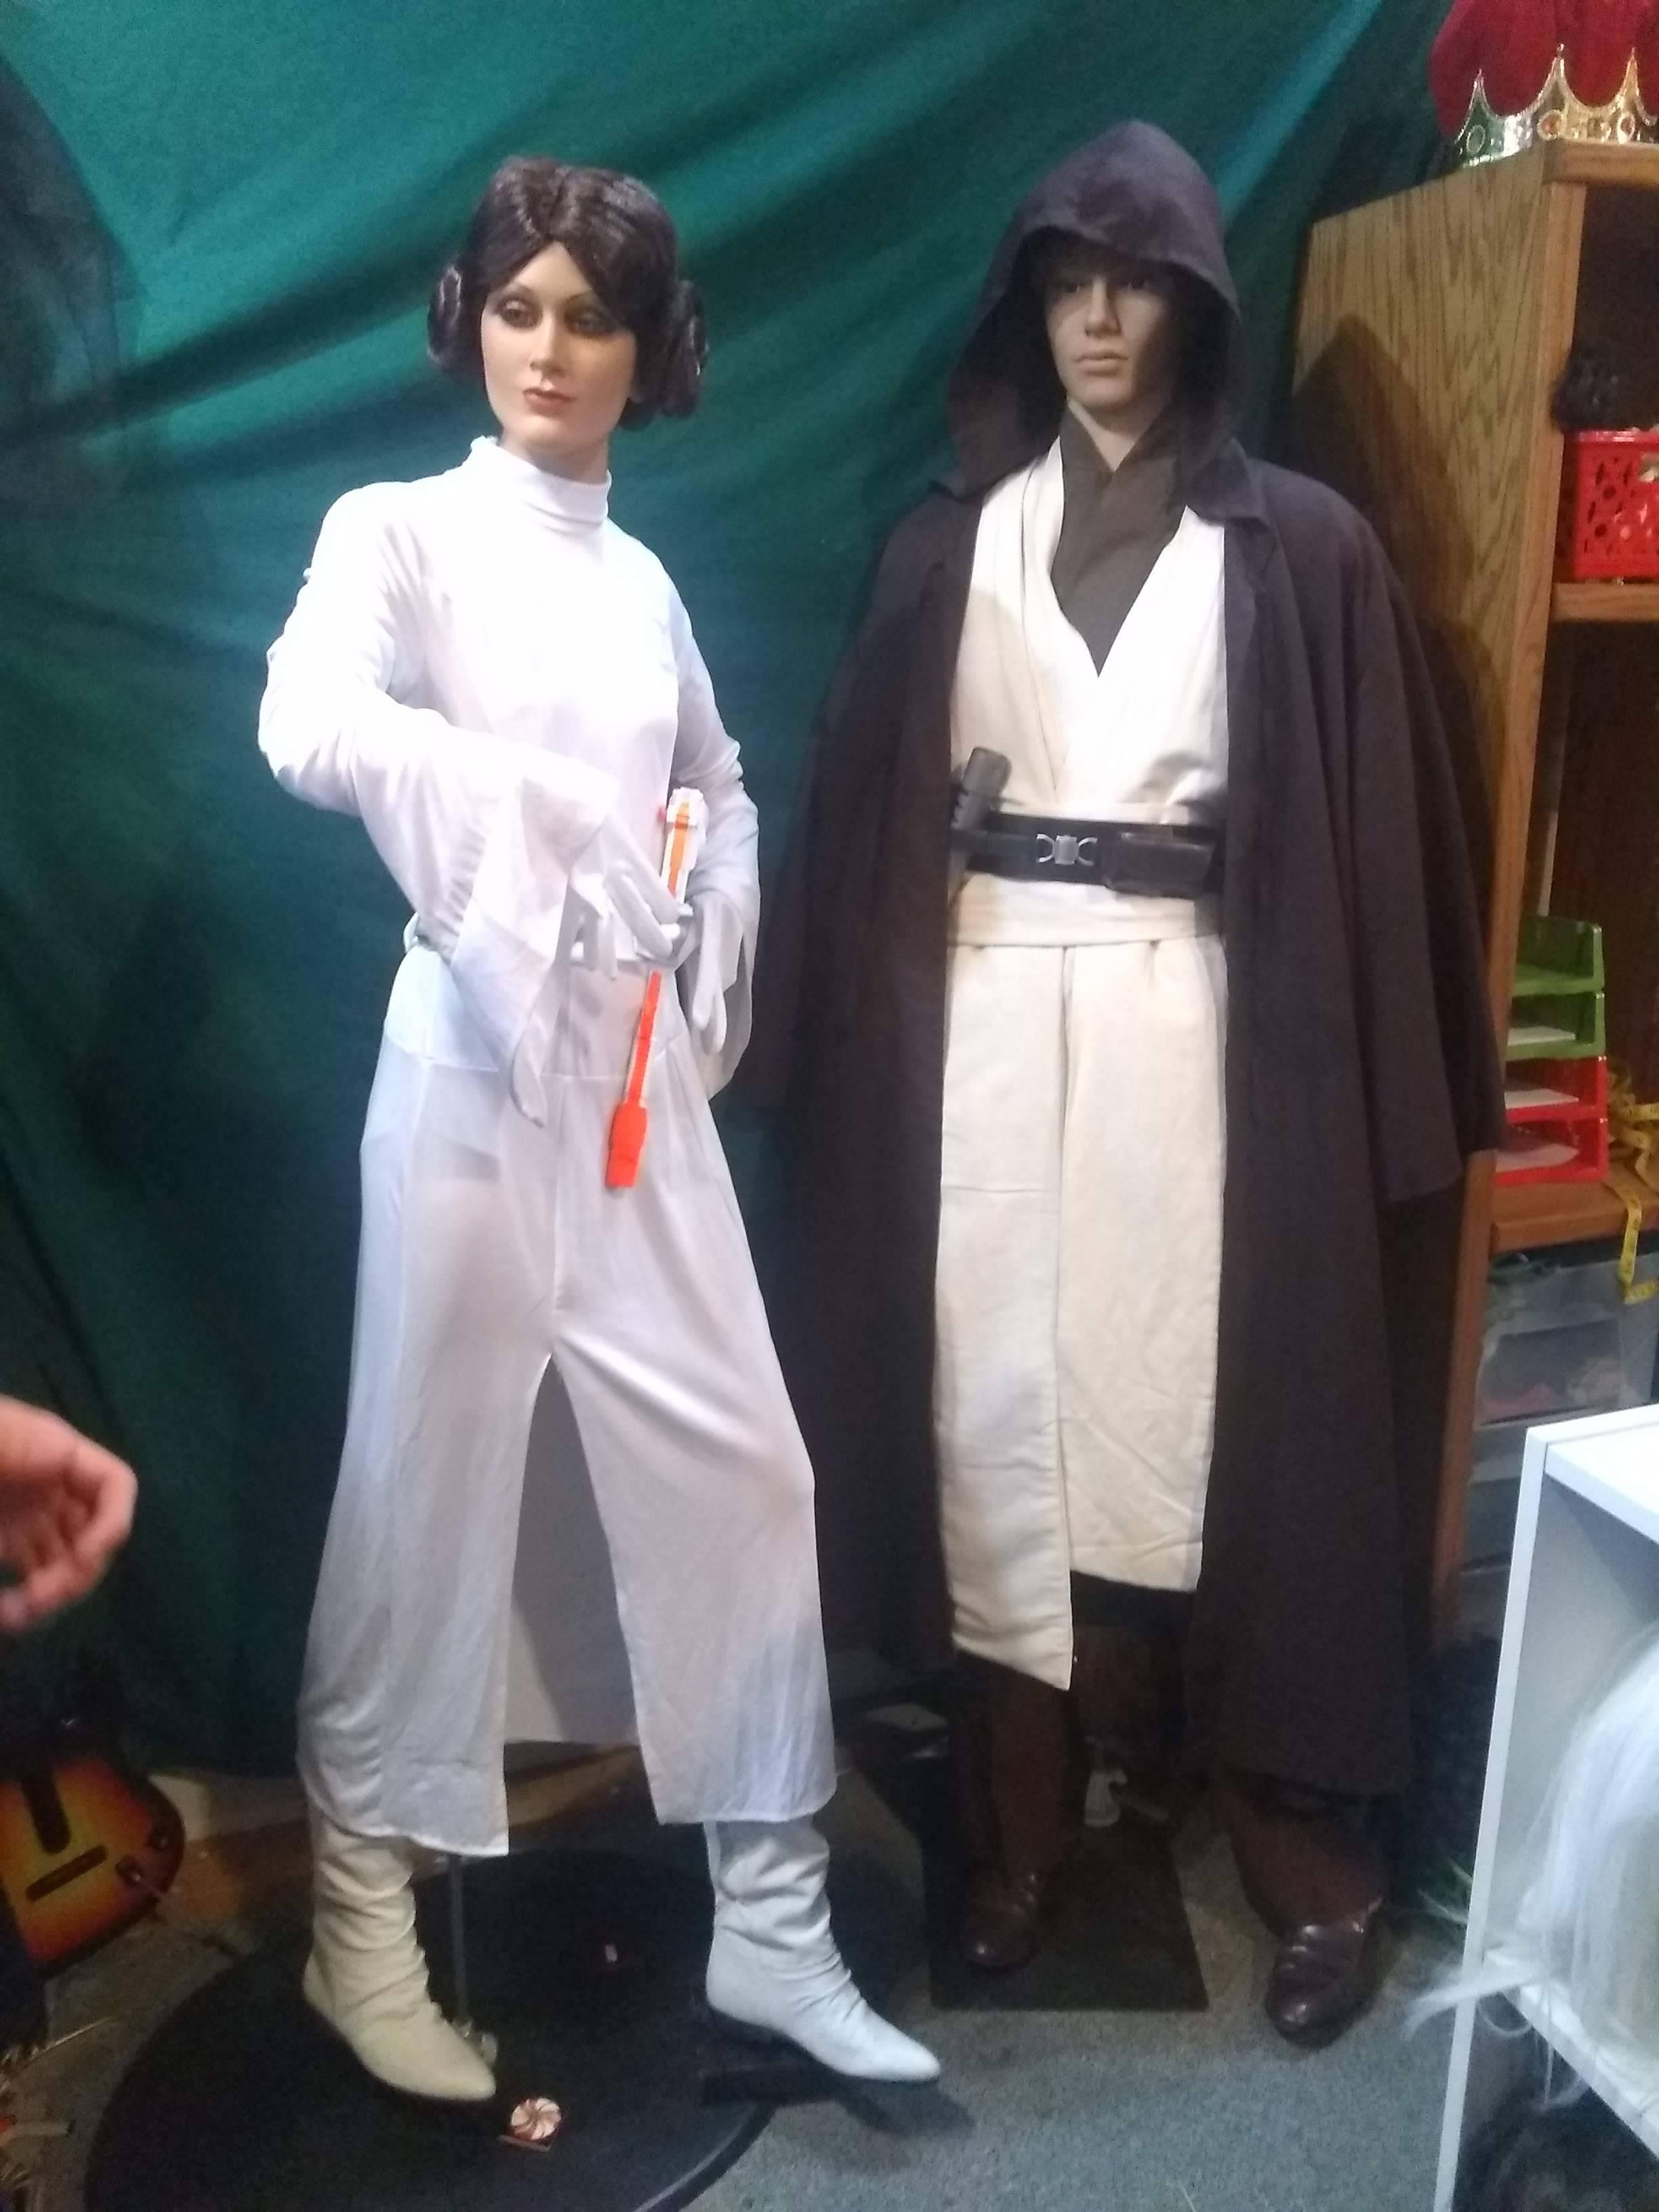 Princess Leia & Obi-Wan Kenobi costumes